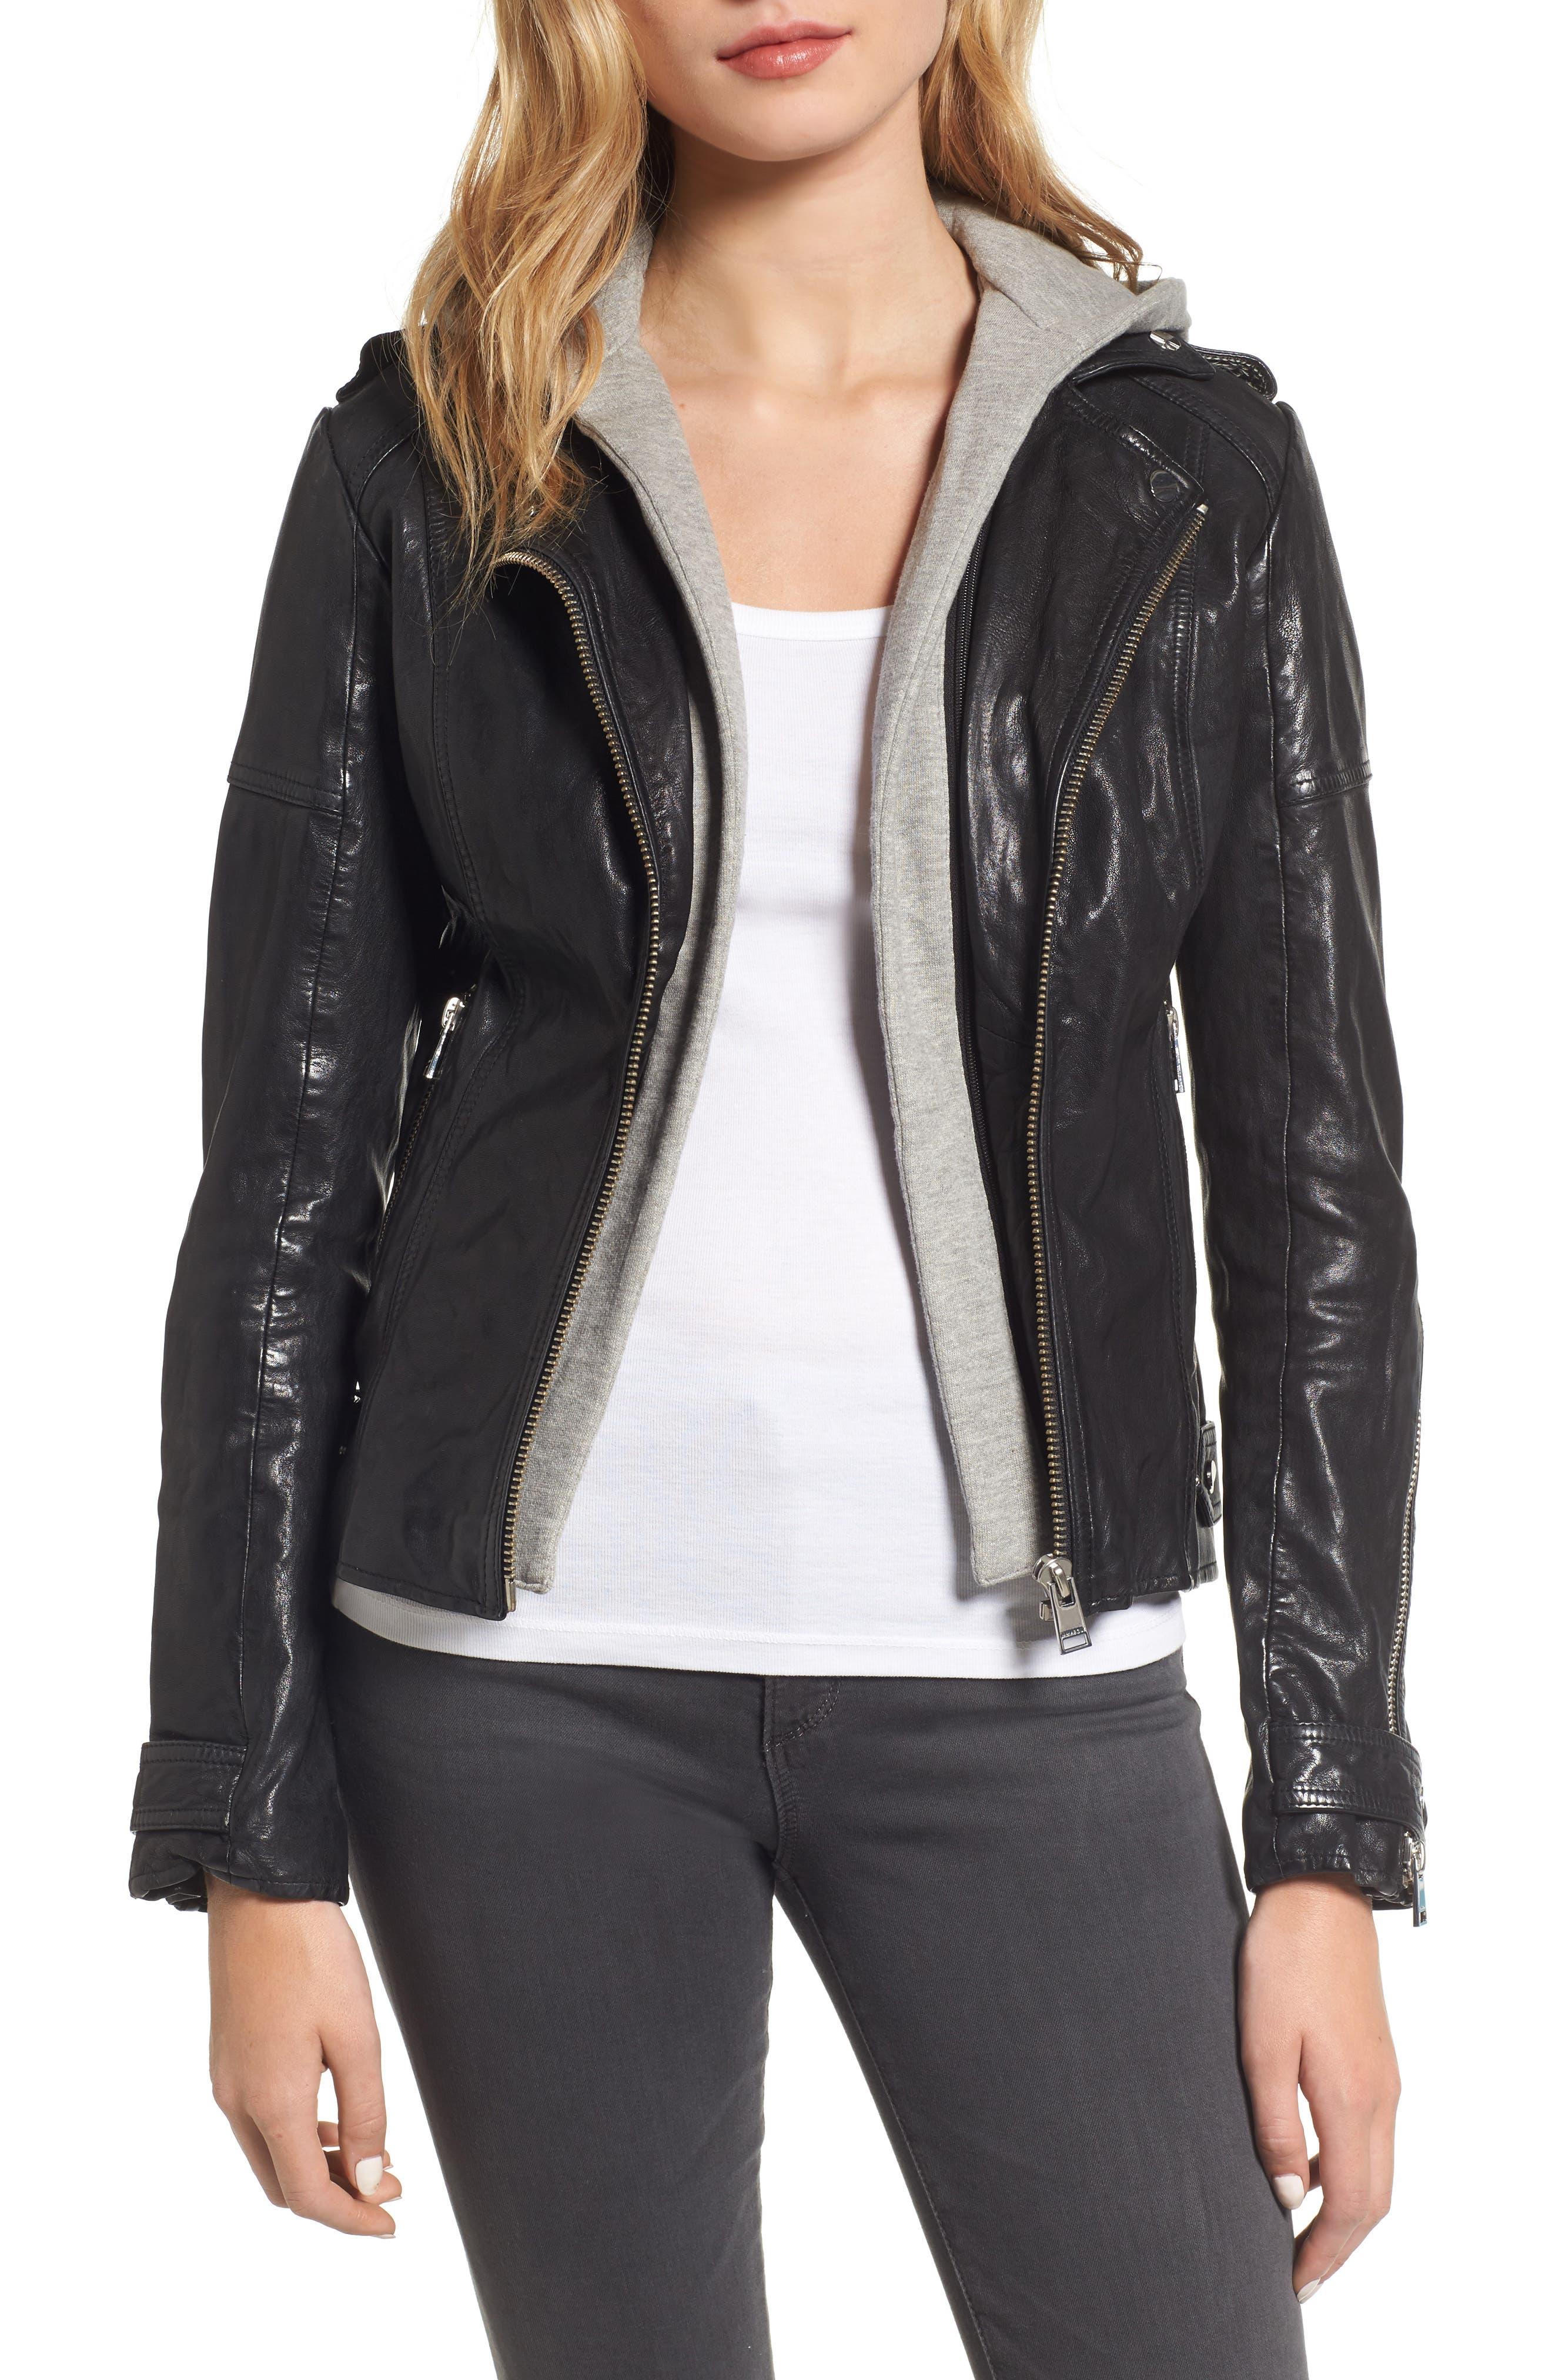 LAMARQUE Hooded Leather Biker Jacket